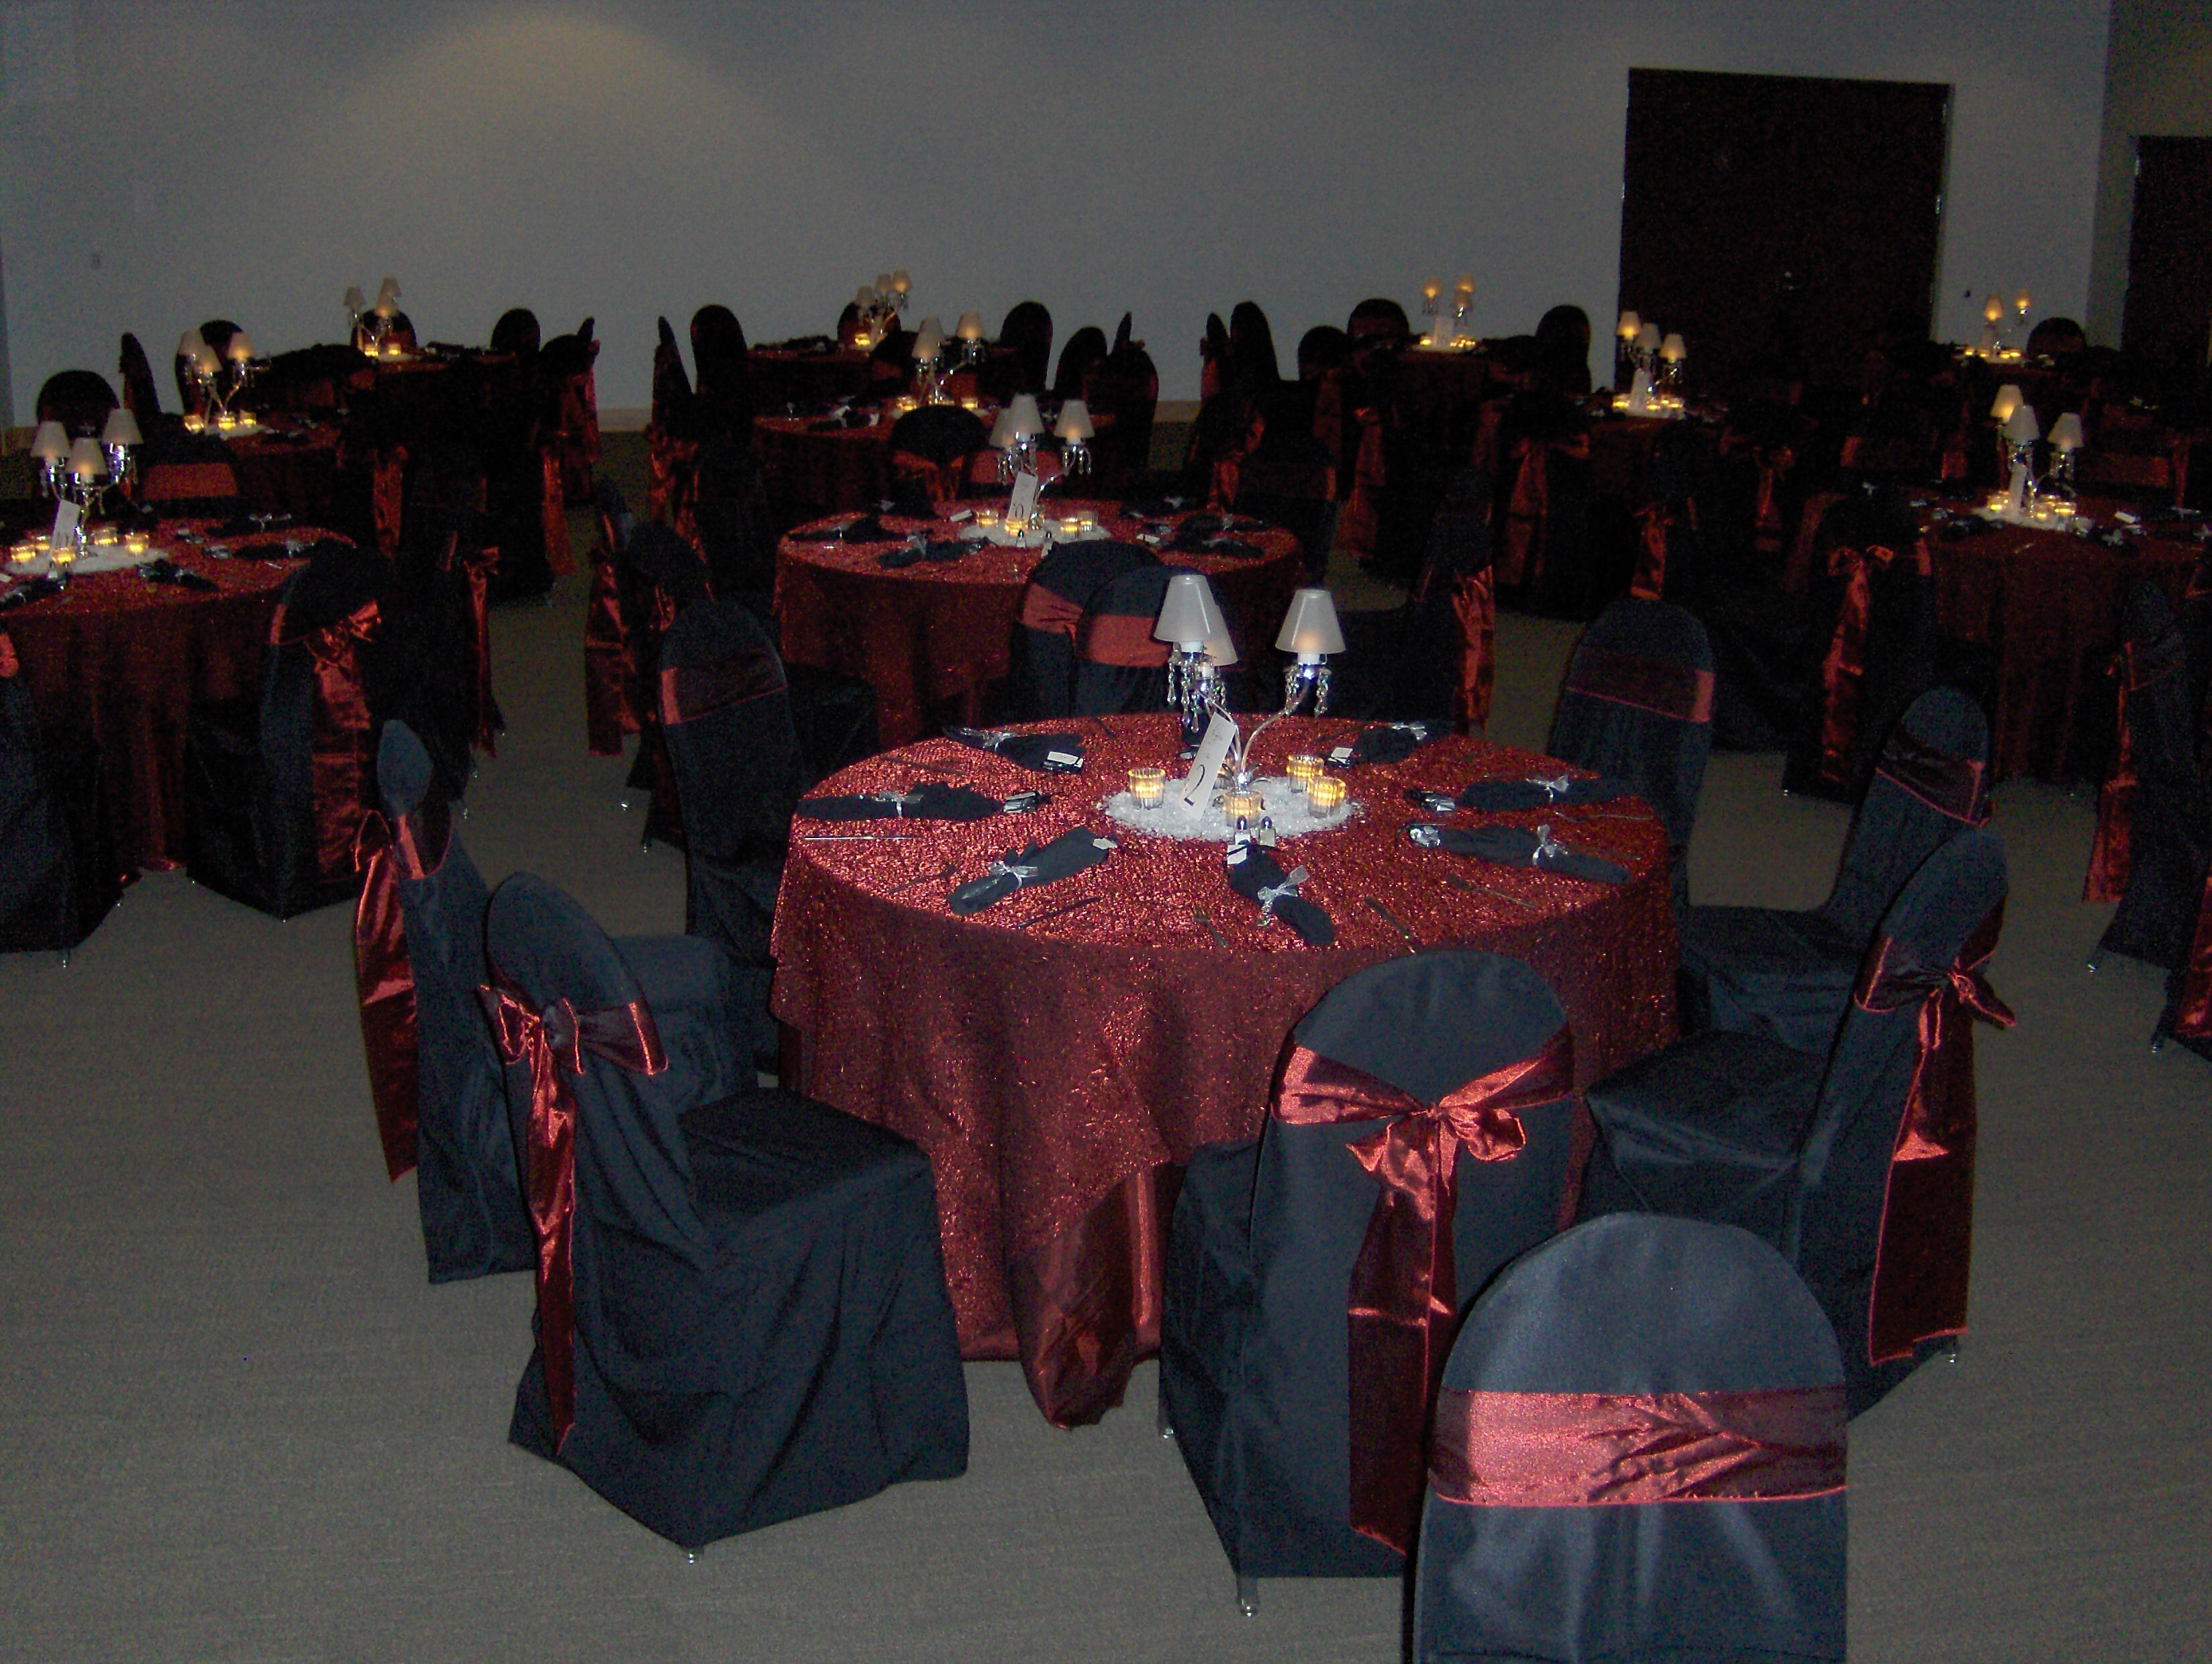 burgundy chair covers wedding fishing nz decor linen black with